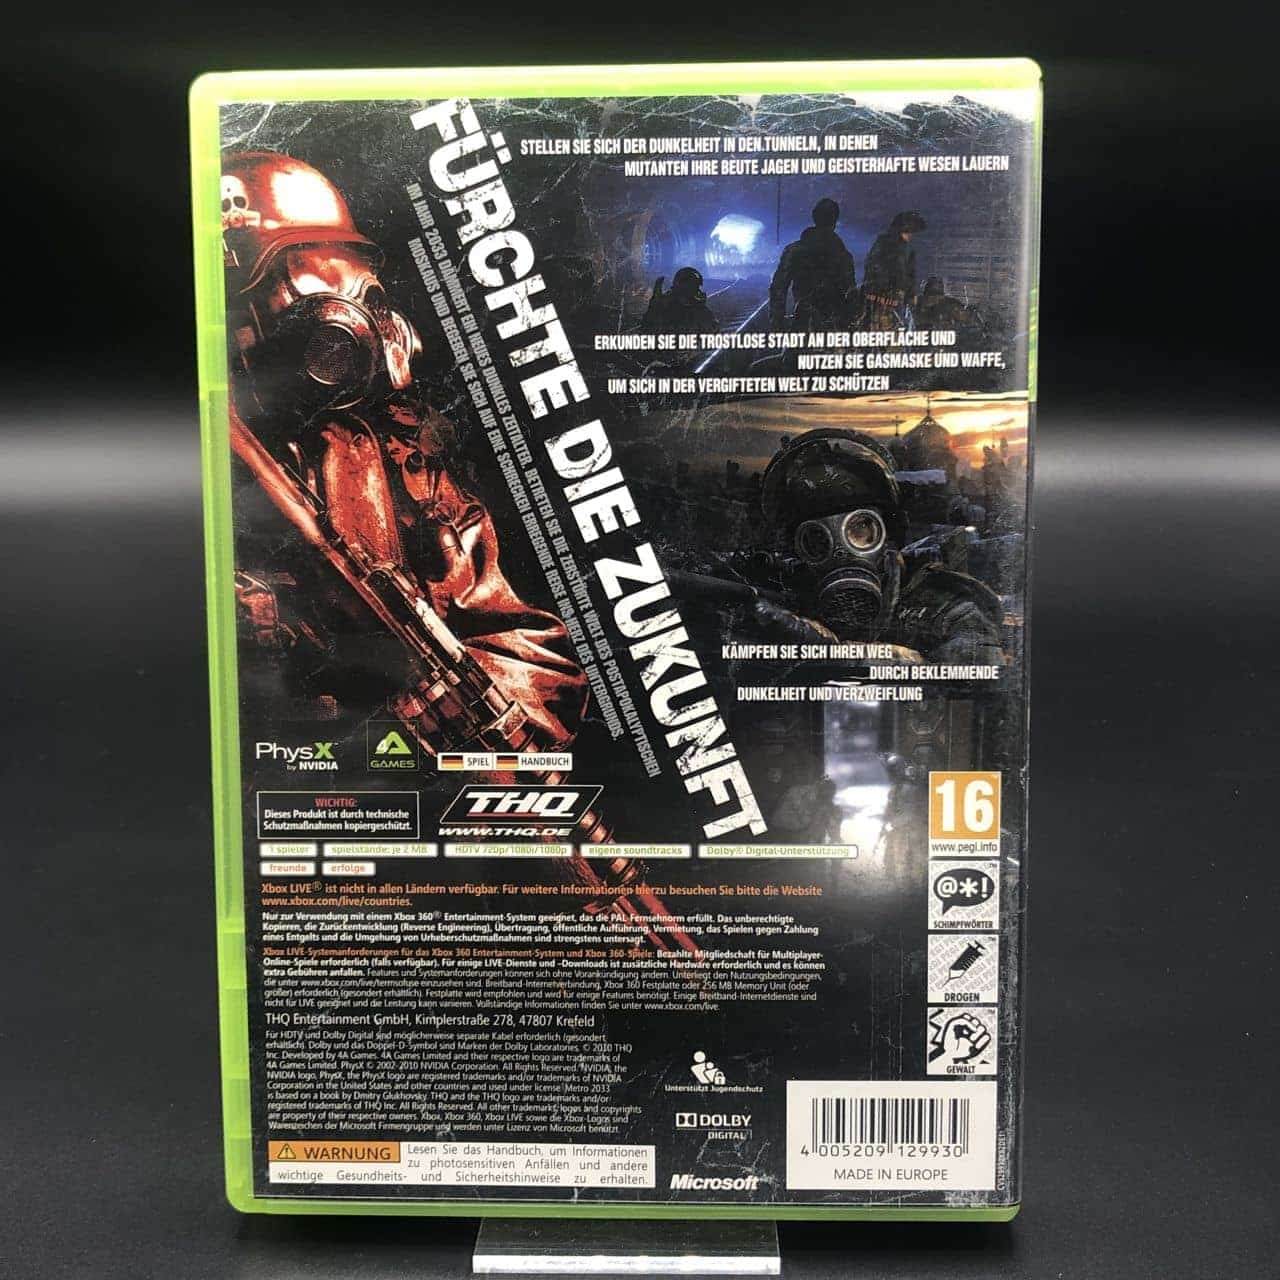 Metro 2033 (Komplett) (Sehr gut) XBOX 360 (FSK18)